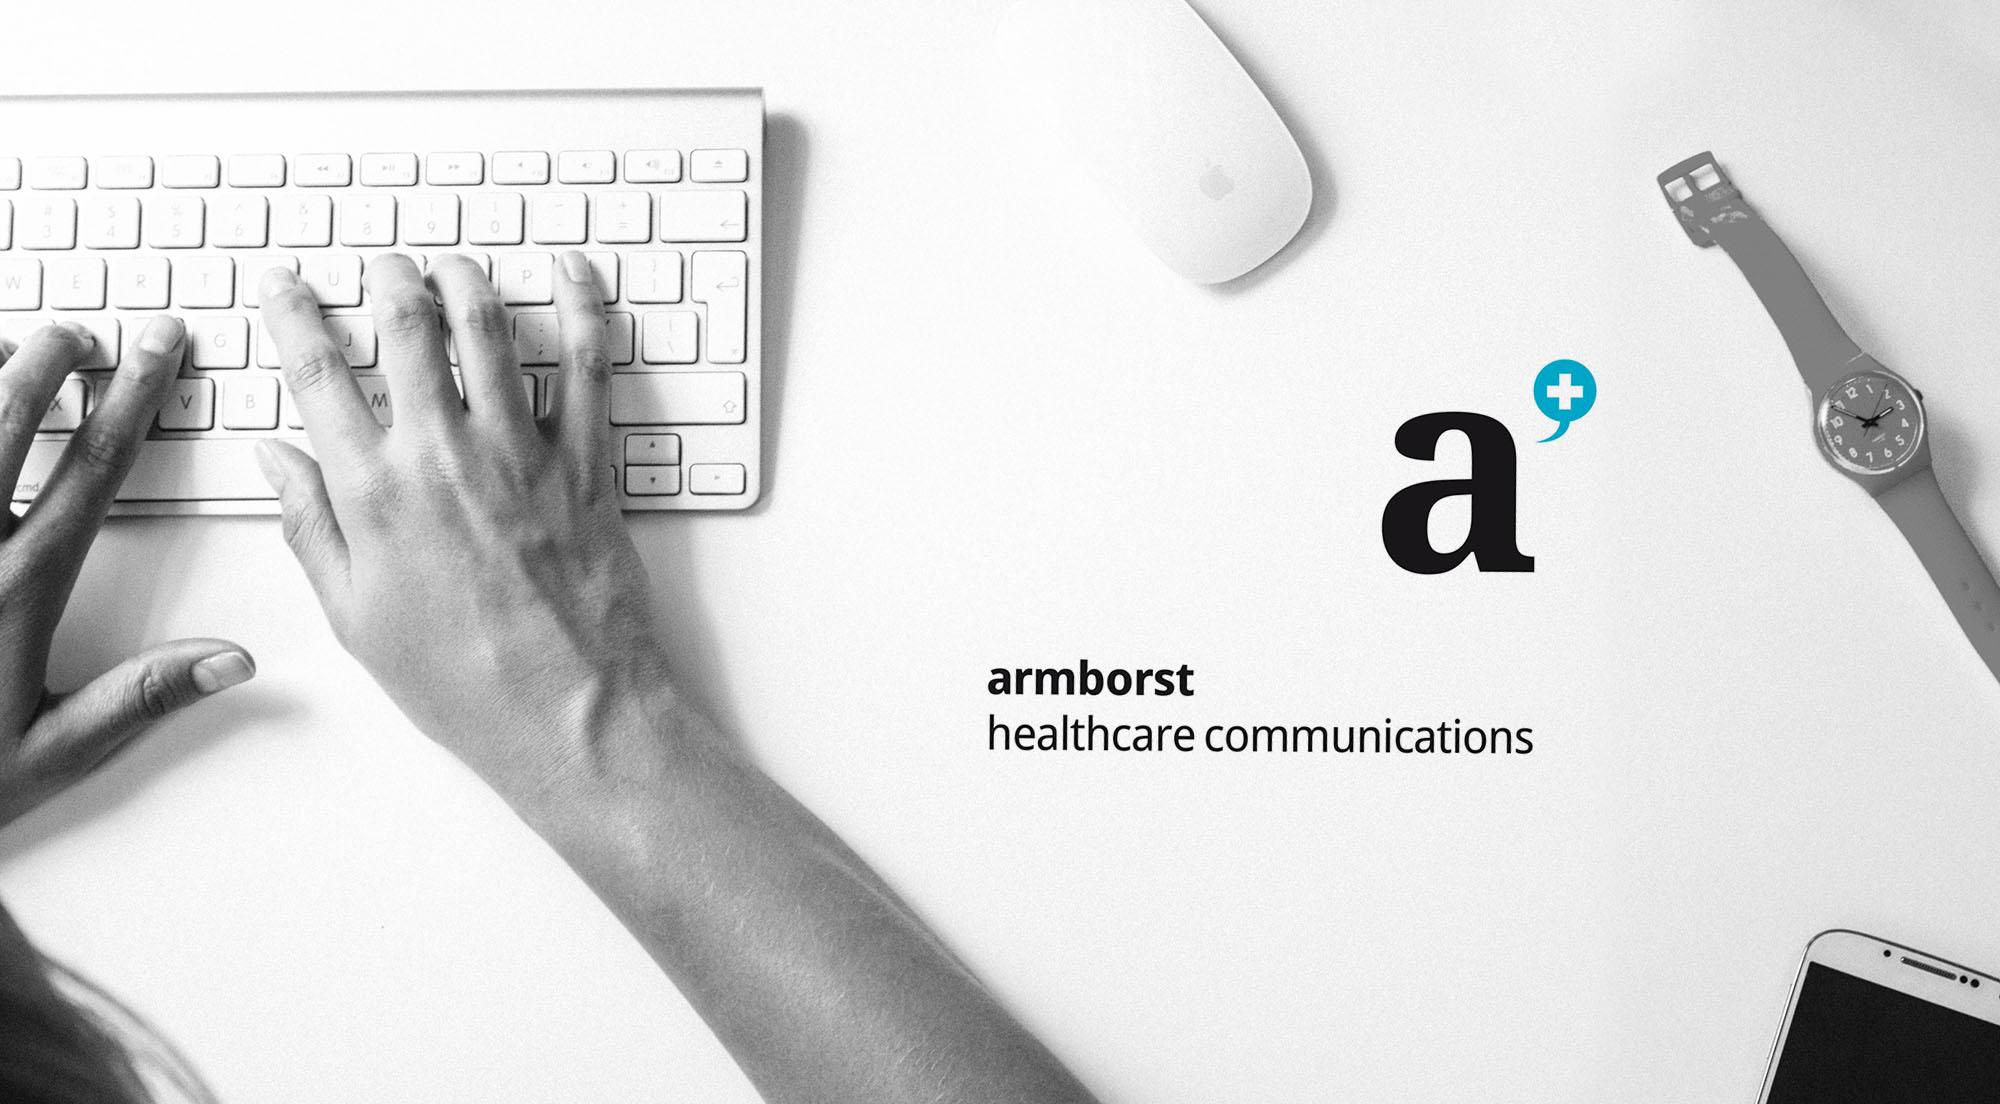 armborst healthcare communications